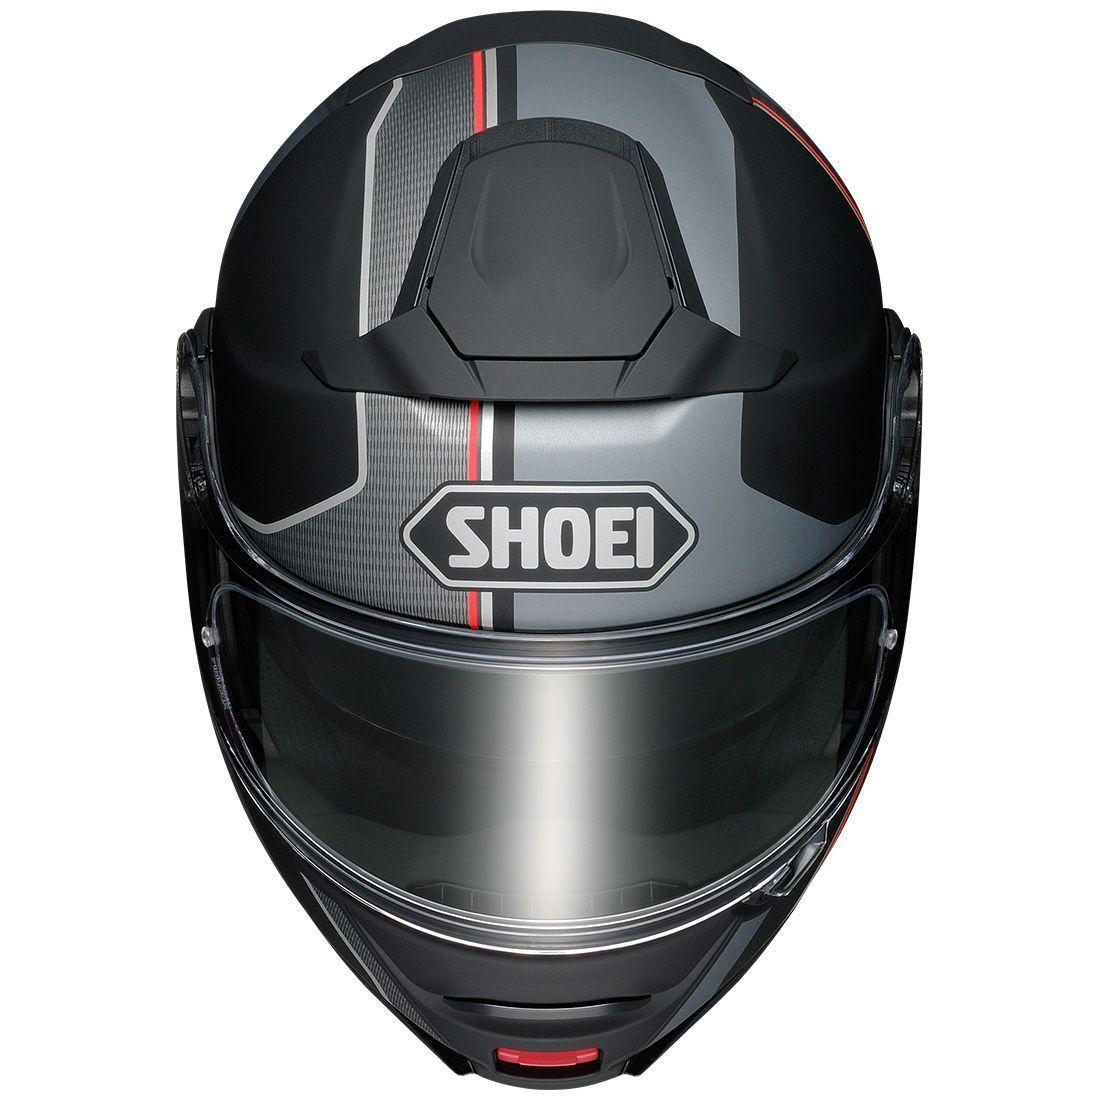 Capacete Shoei Neotec 2 Excursion TC-5 Escamoteável   - Nova Centro Boutique Roupas para Motociclistas